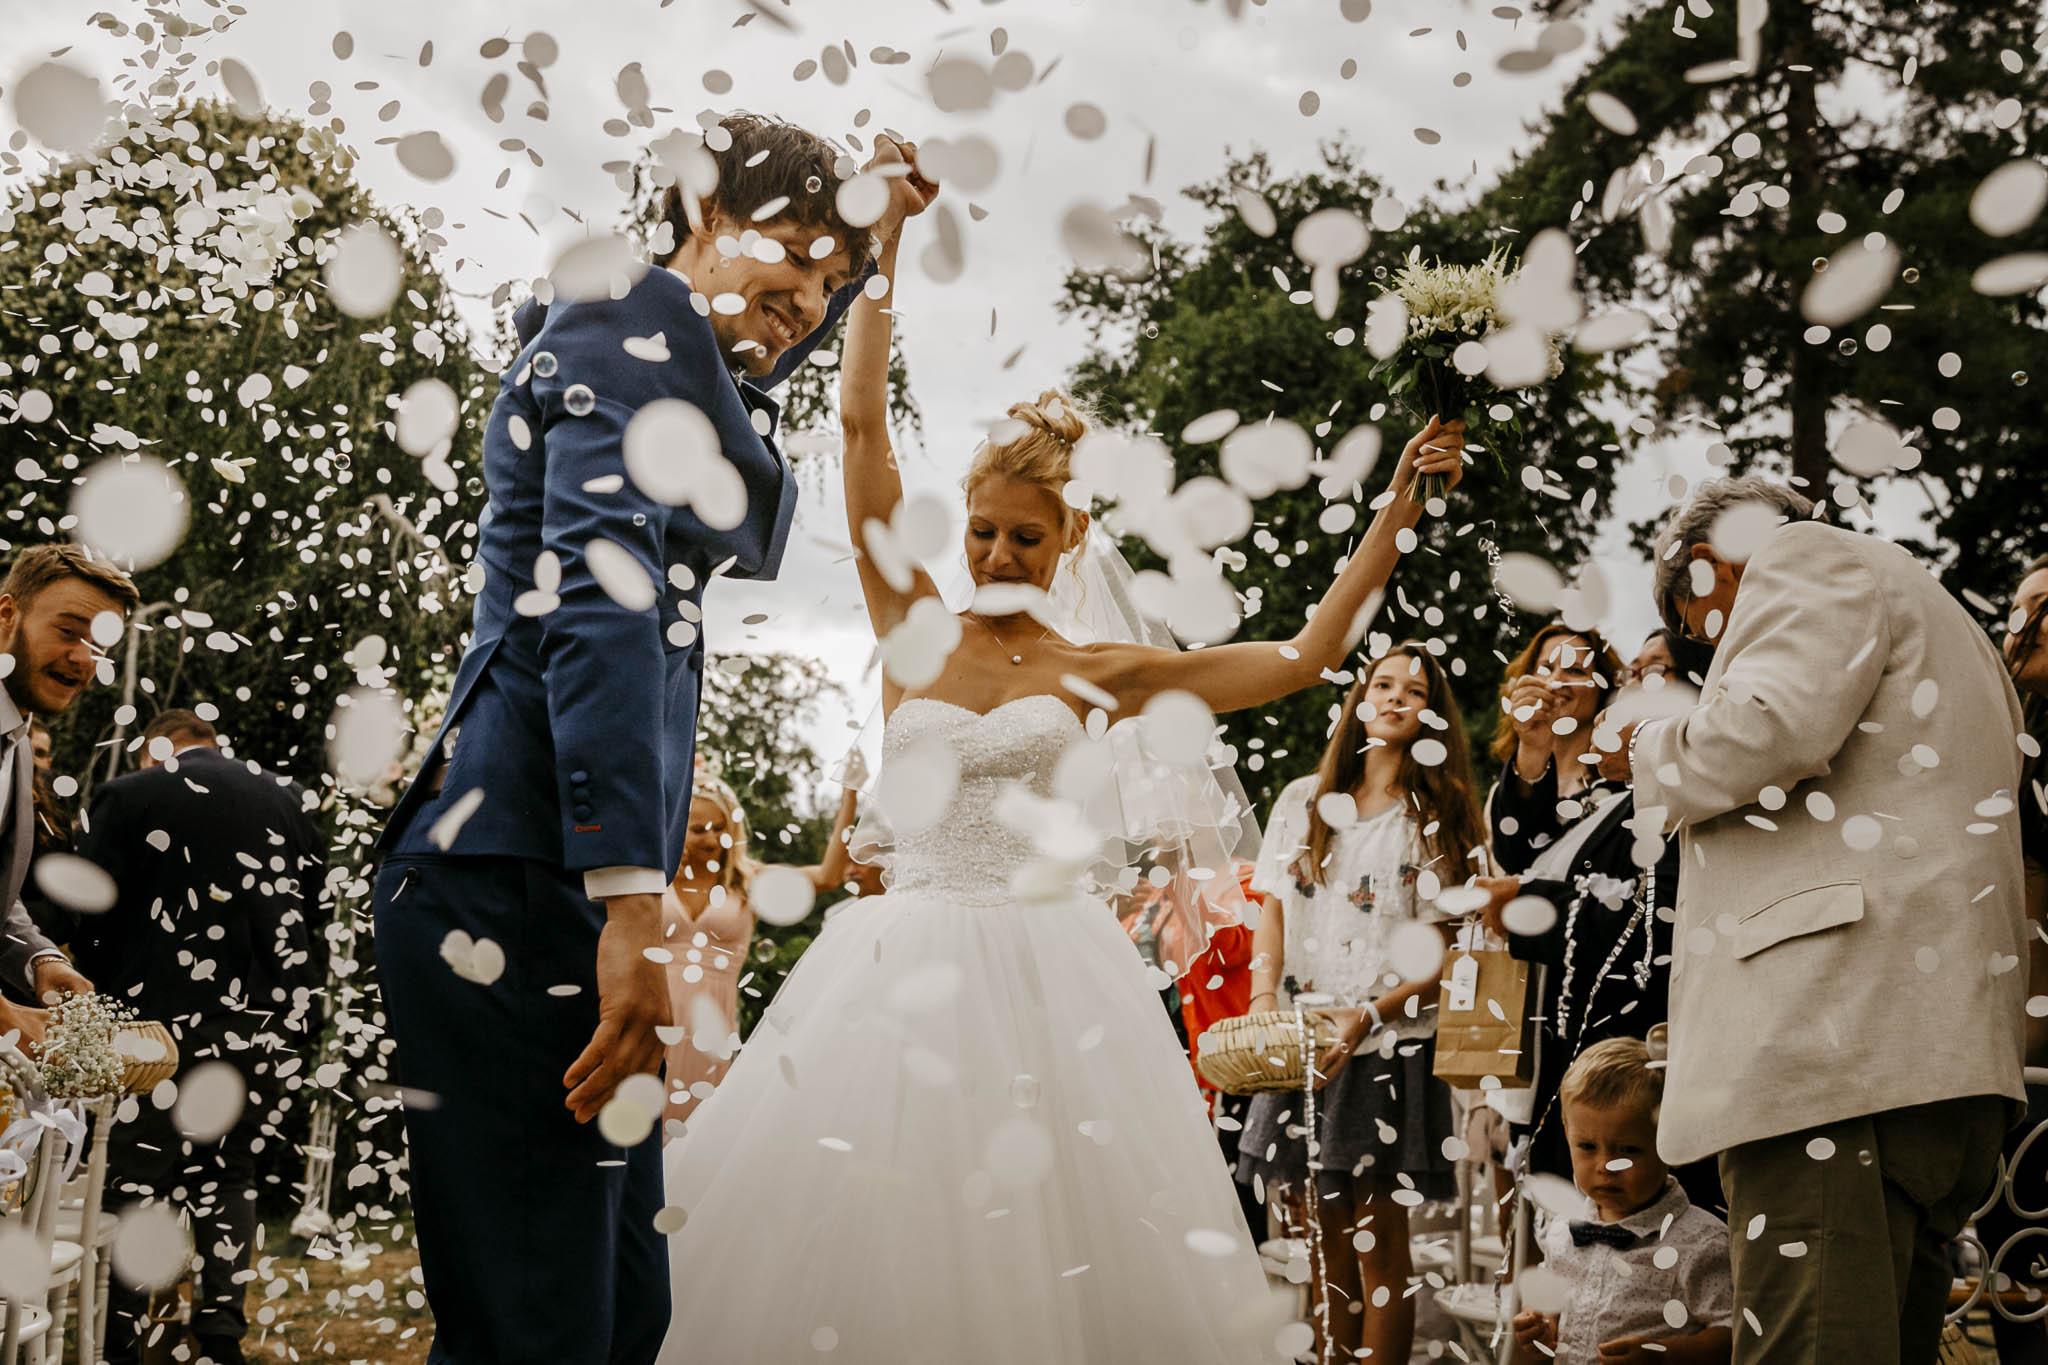 mariage-chateau-gaudras-ingold-57.jpg